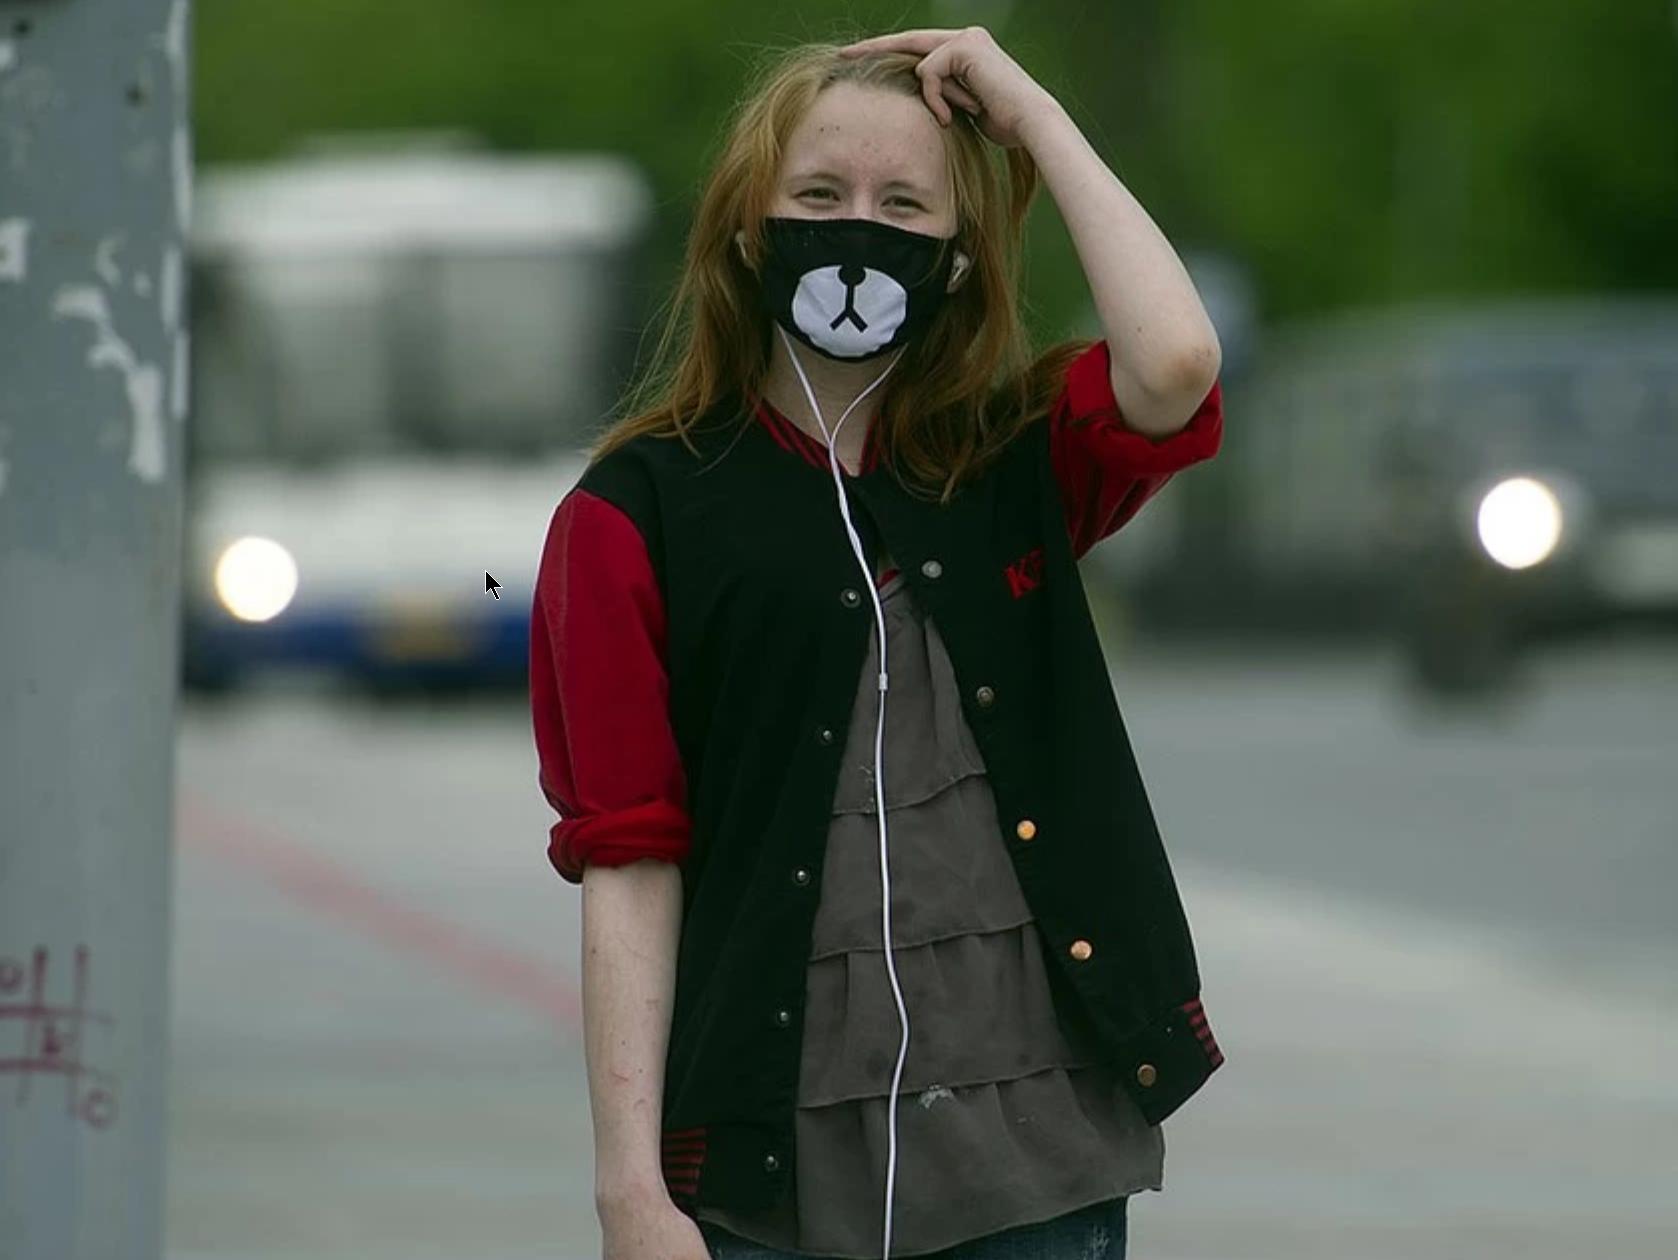 Фото взято с сайта: www.kp.ru